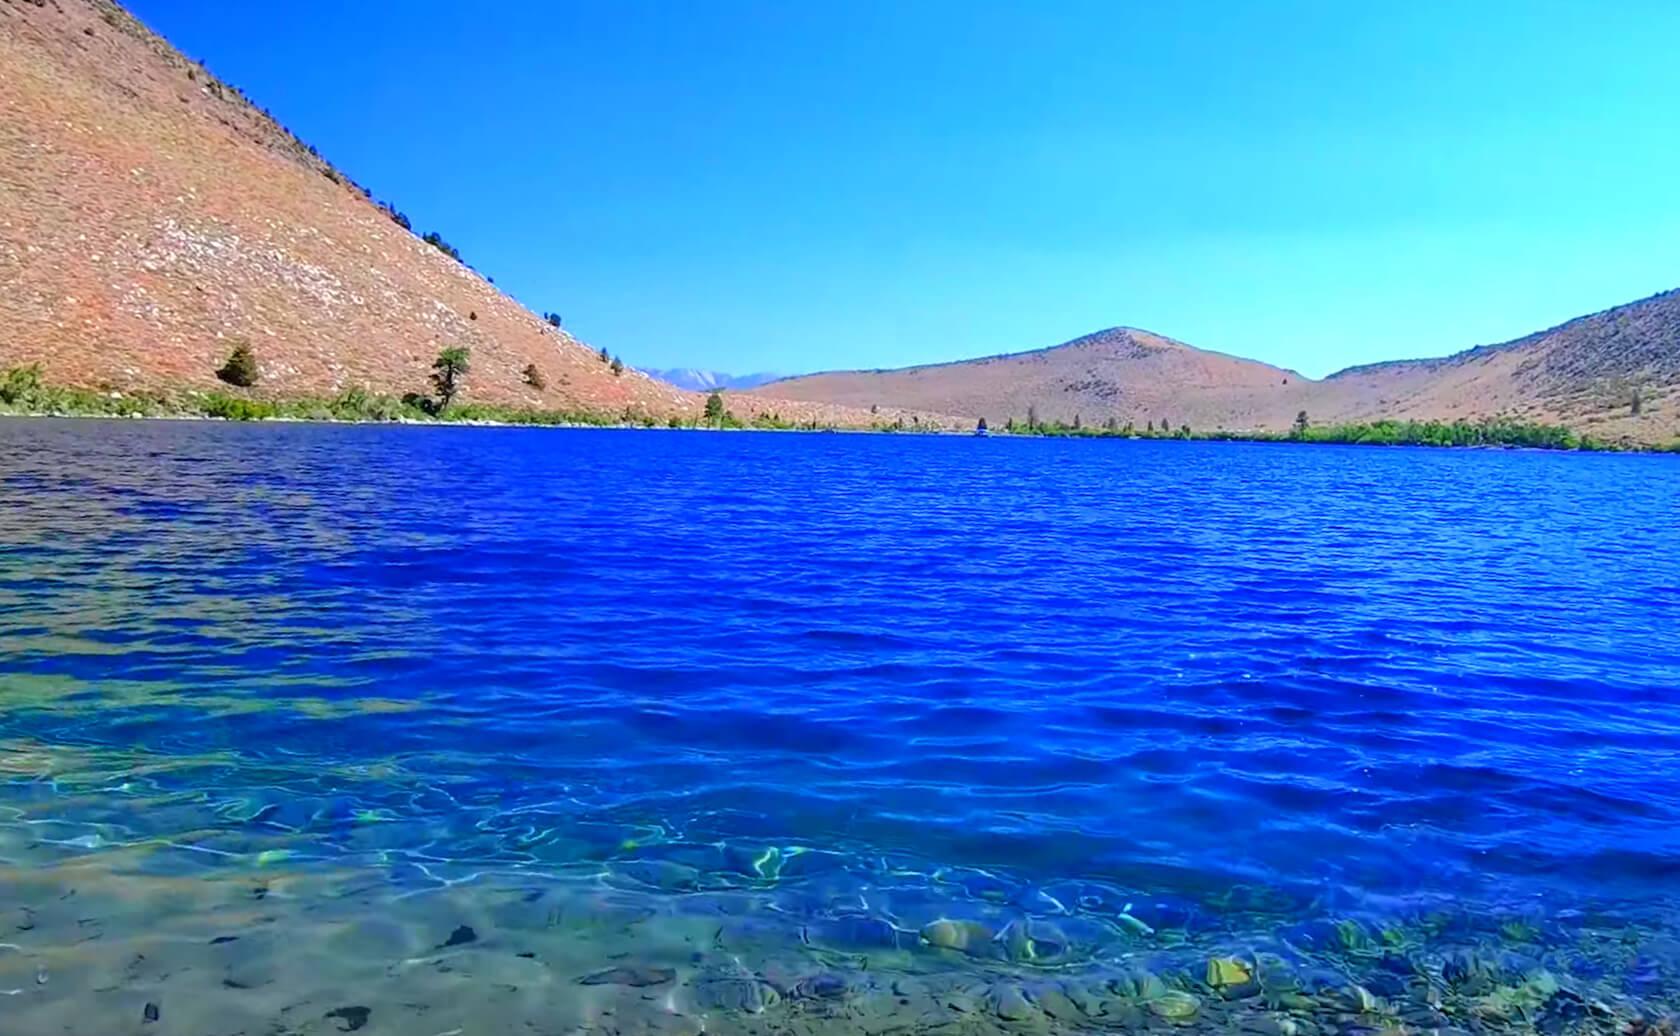 Convict-Lake-Reservoir-Fishing-Guide-Report-California-07